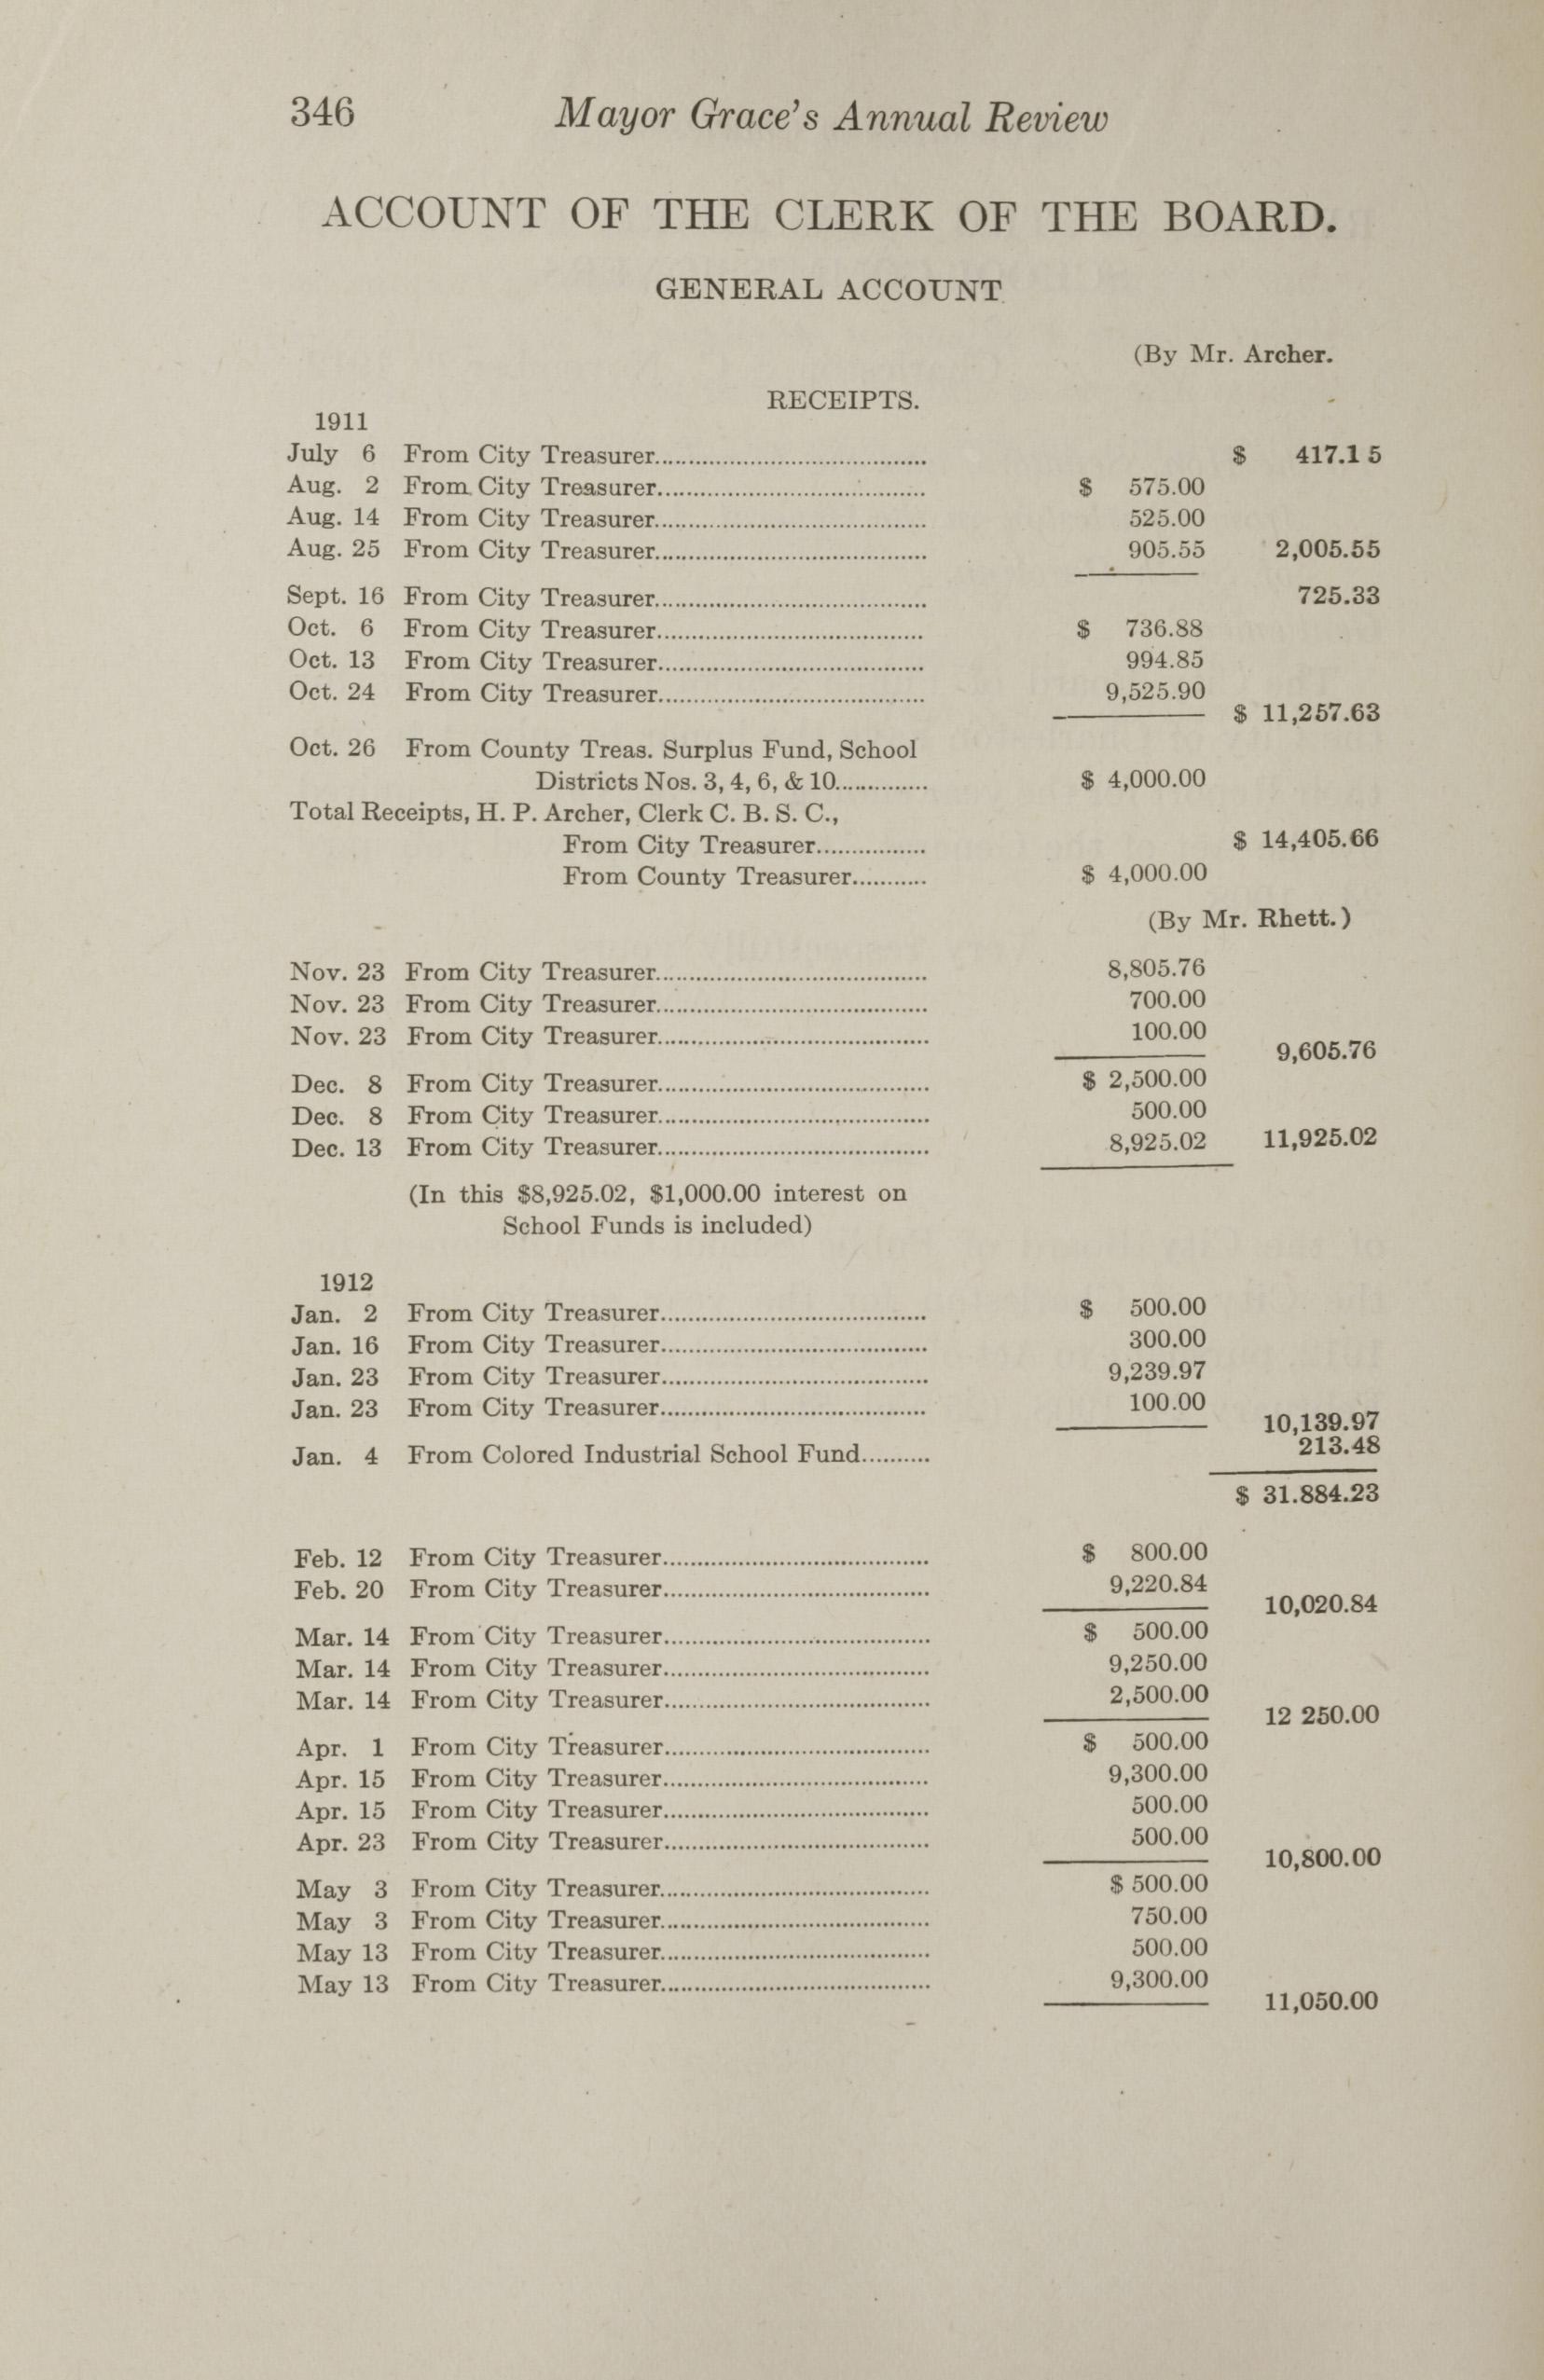 Charleston Yearbook, 1912, page 346